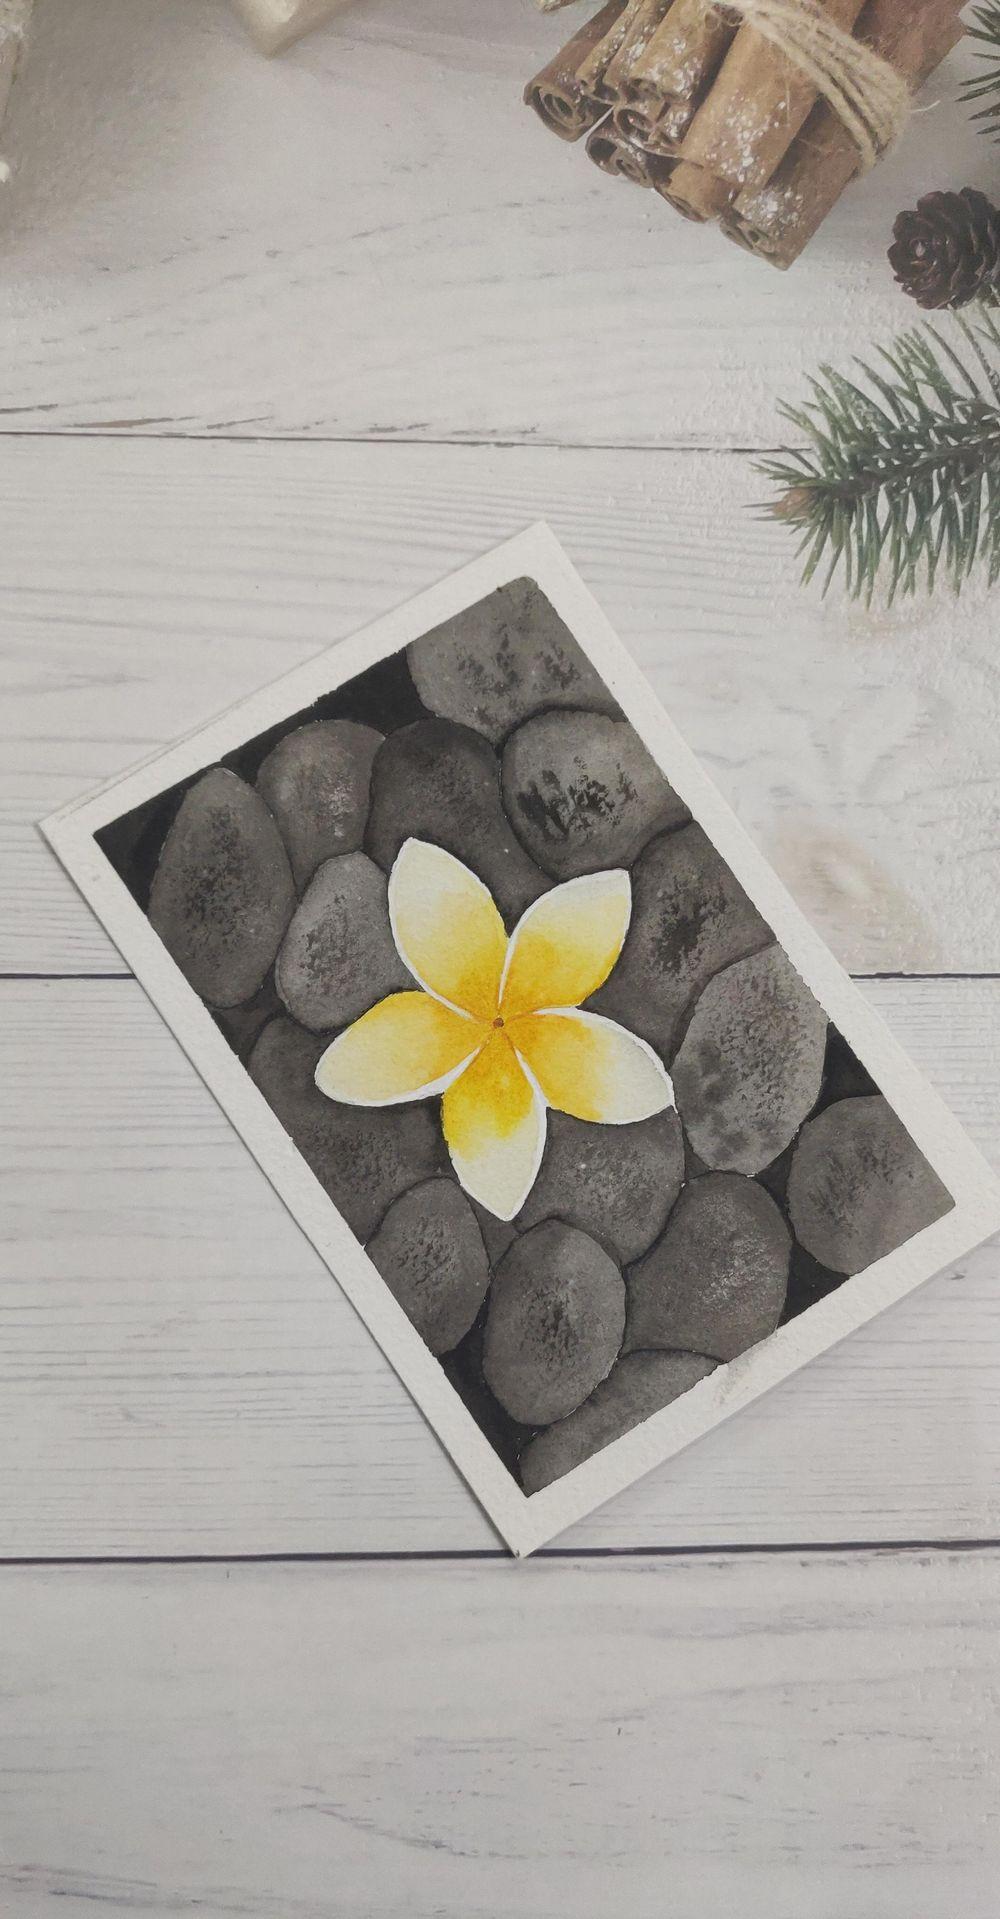 Watercolor postcards: Color splash series - image 12 - student project